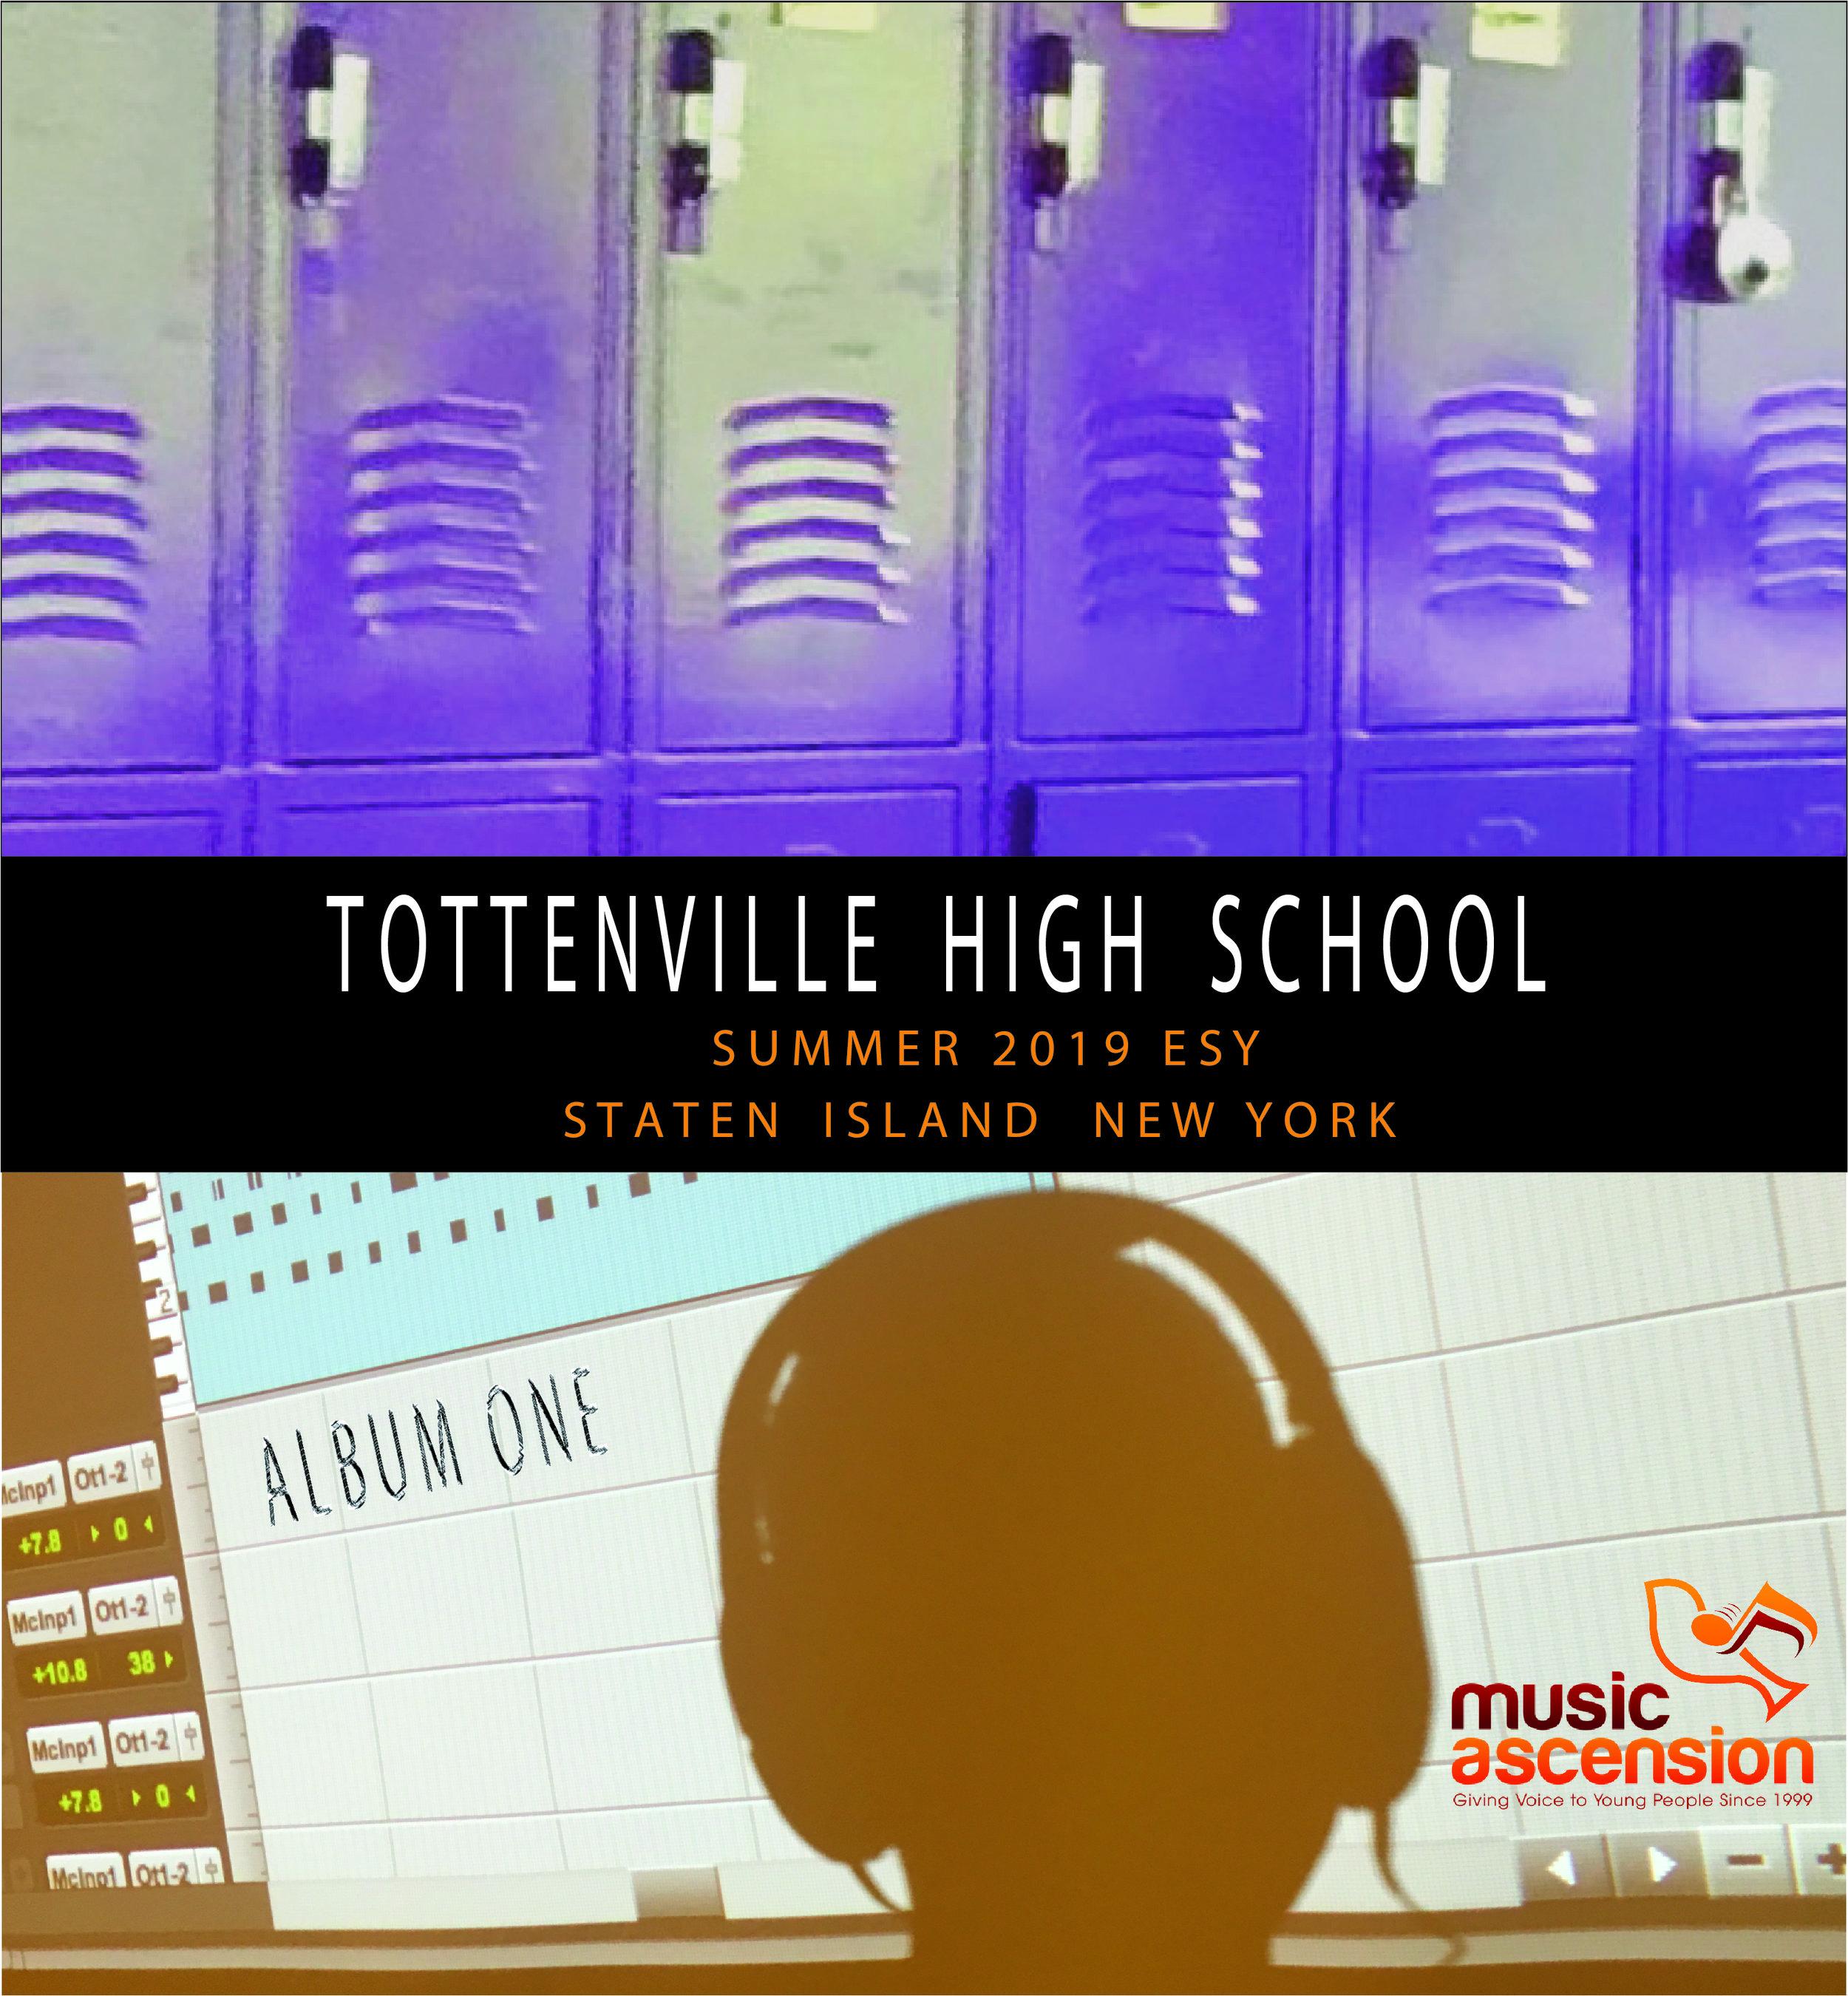 TOTTENVILLE ALBUM COVER2.jpg